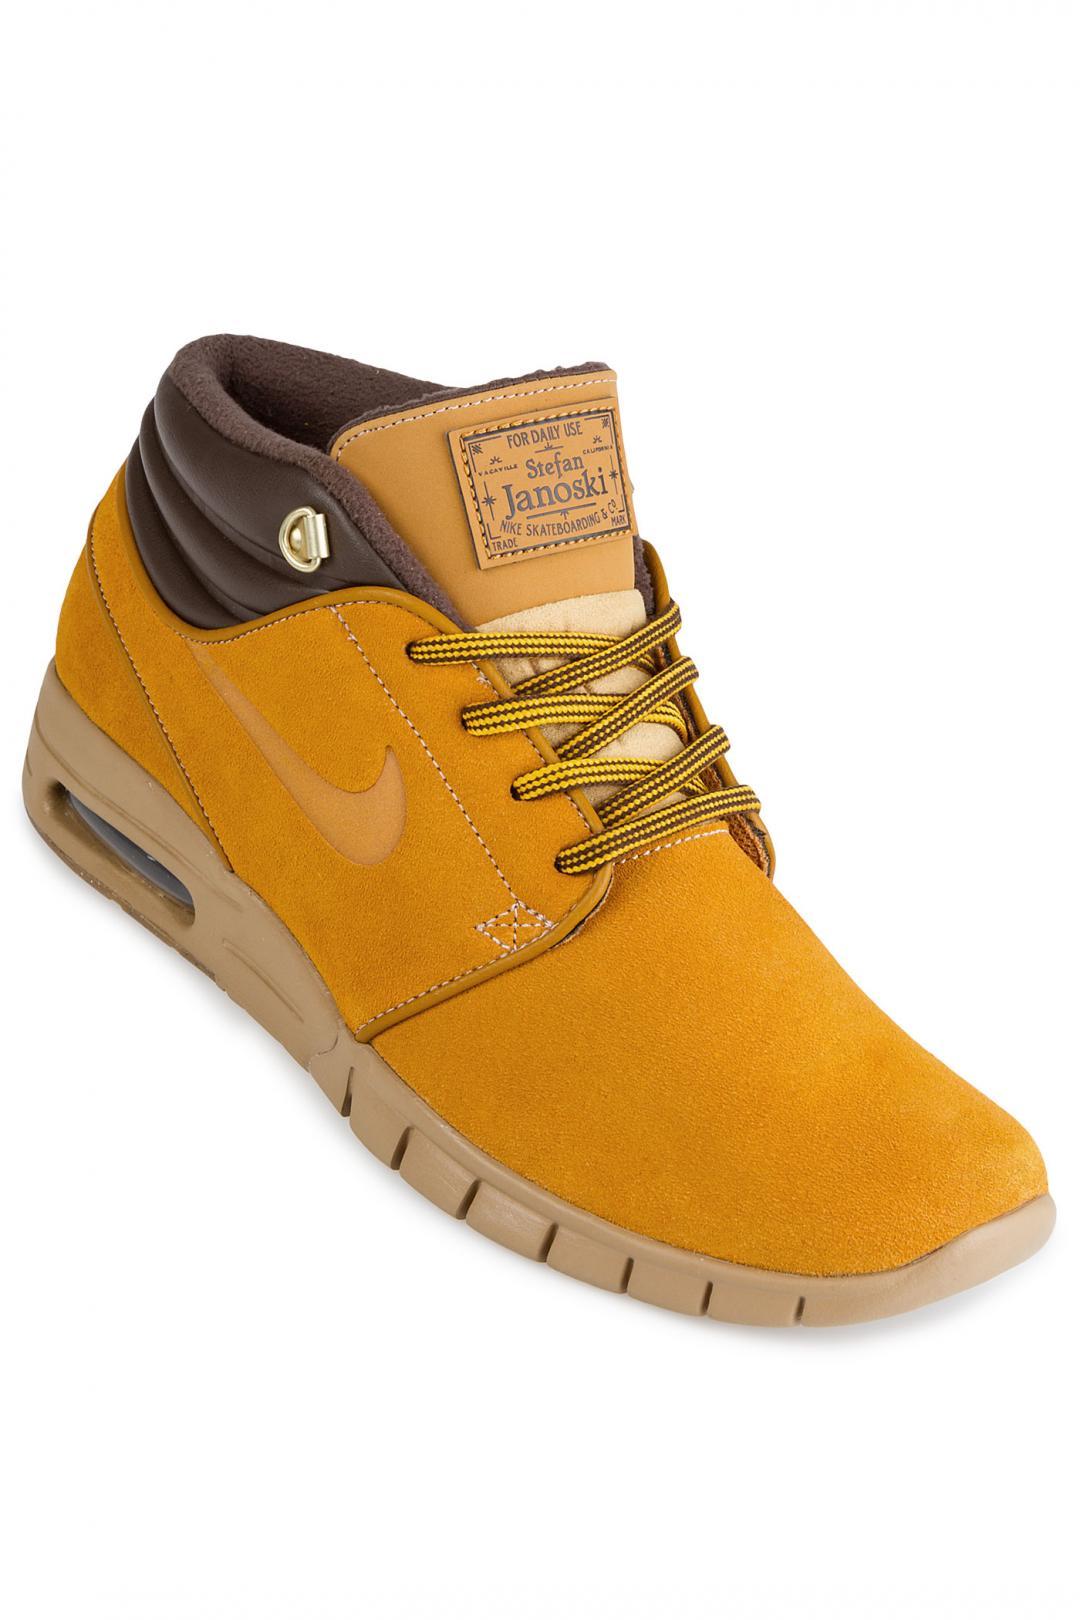 Uomo Nike SB Stefan Janoski Max Mid Premium bronze | Sneaker